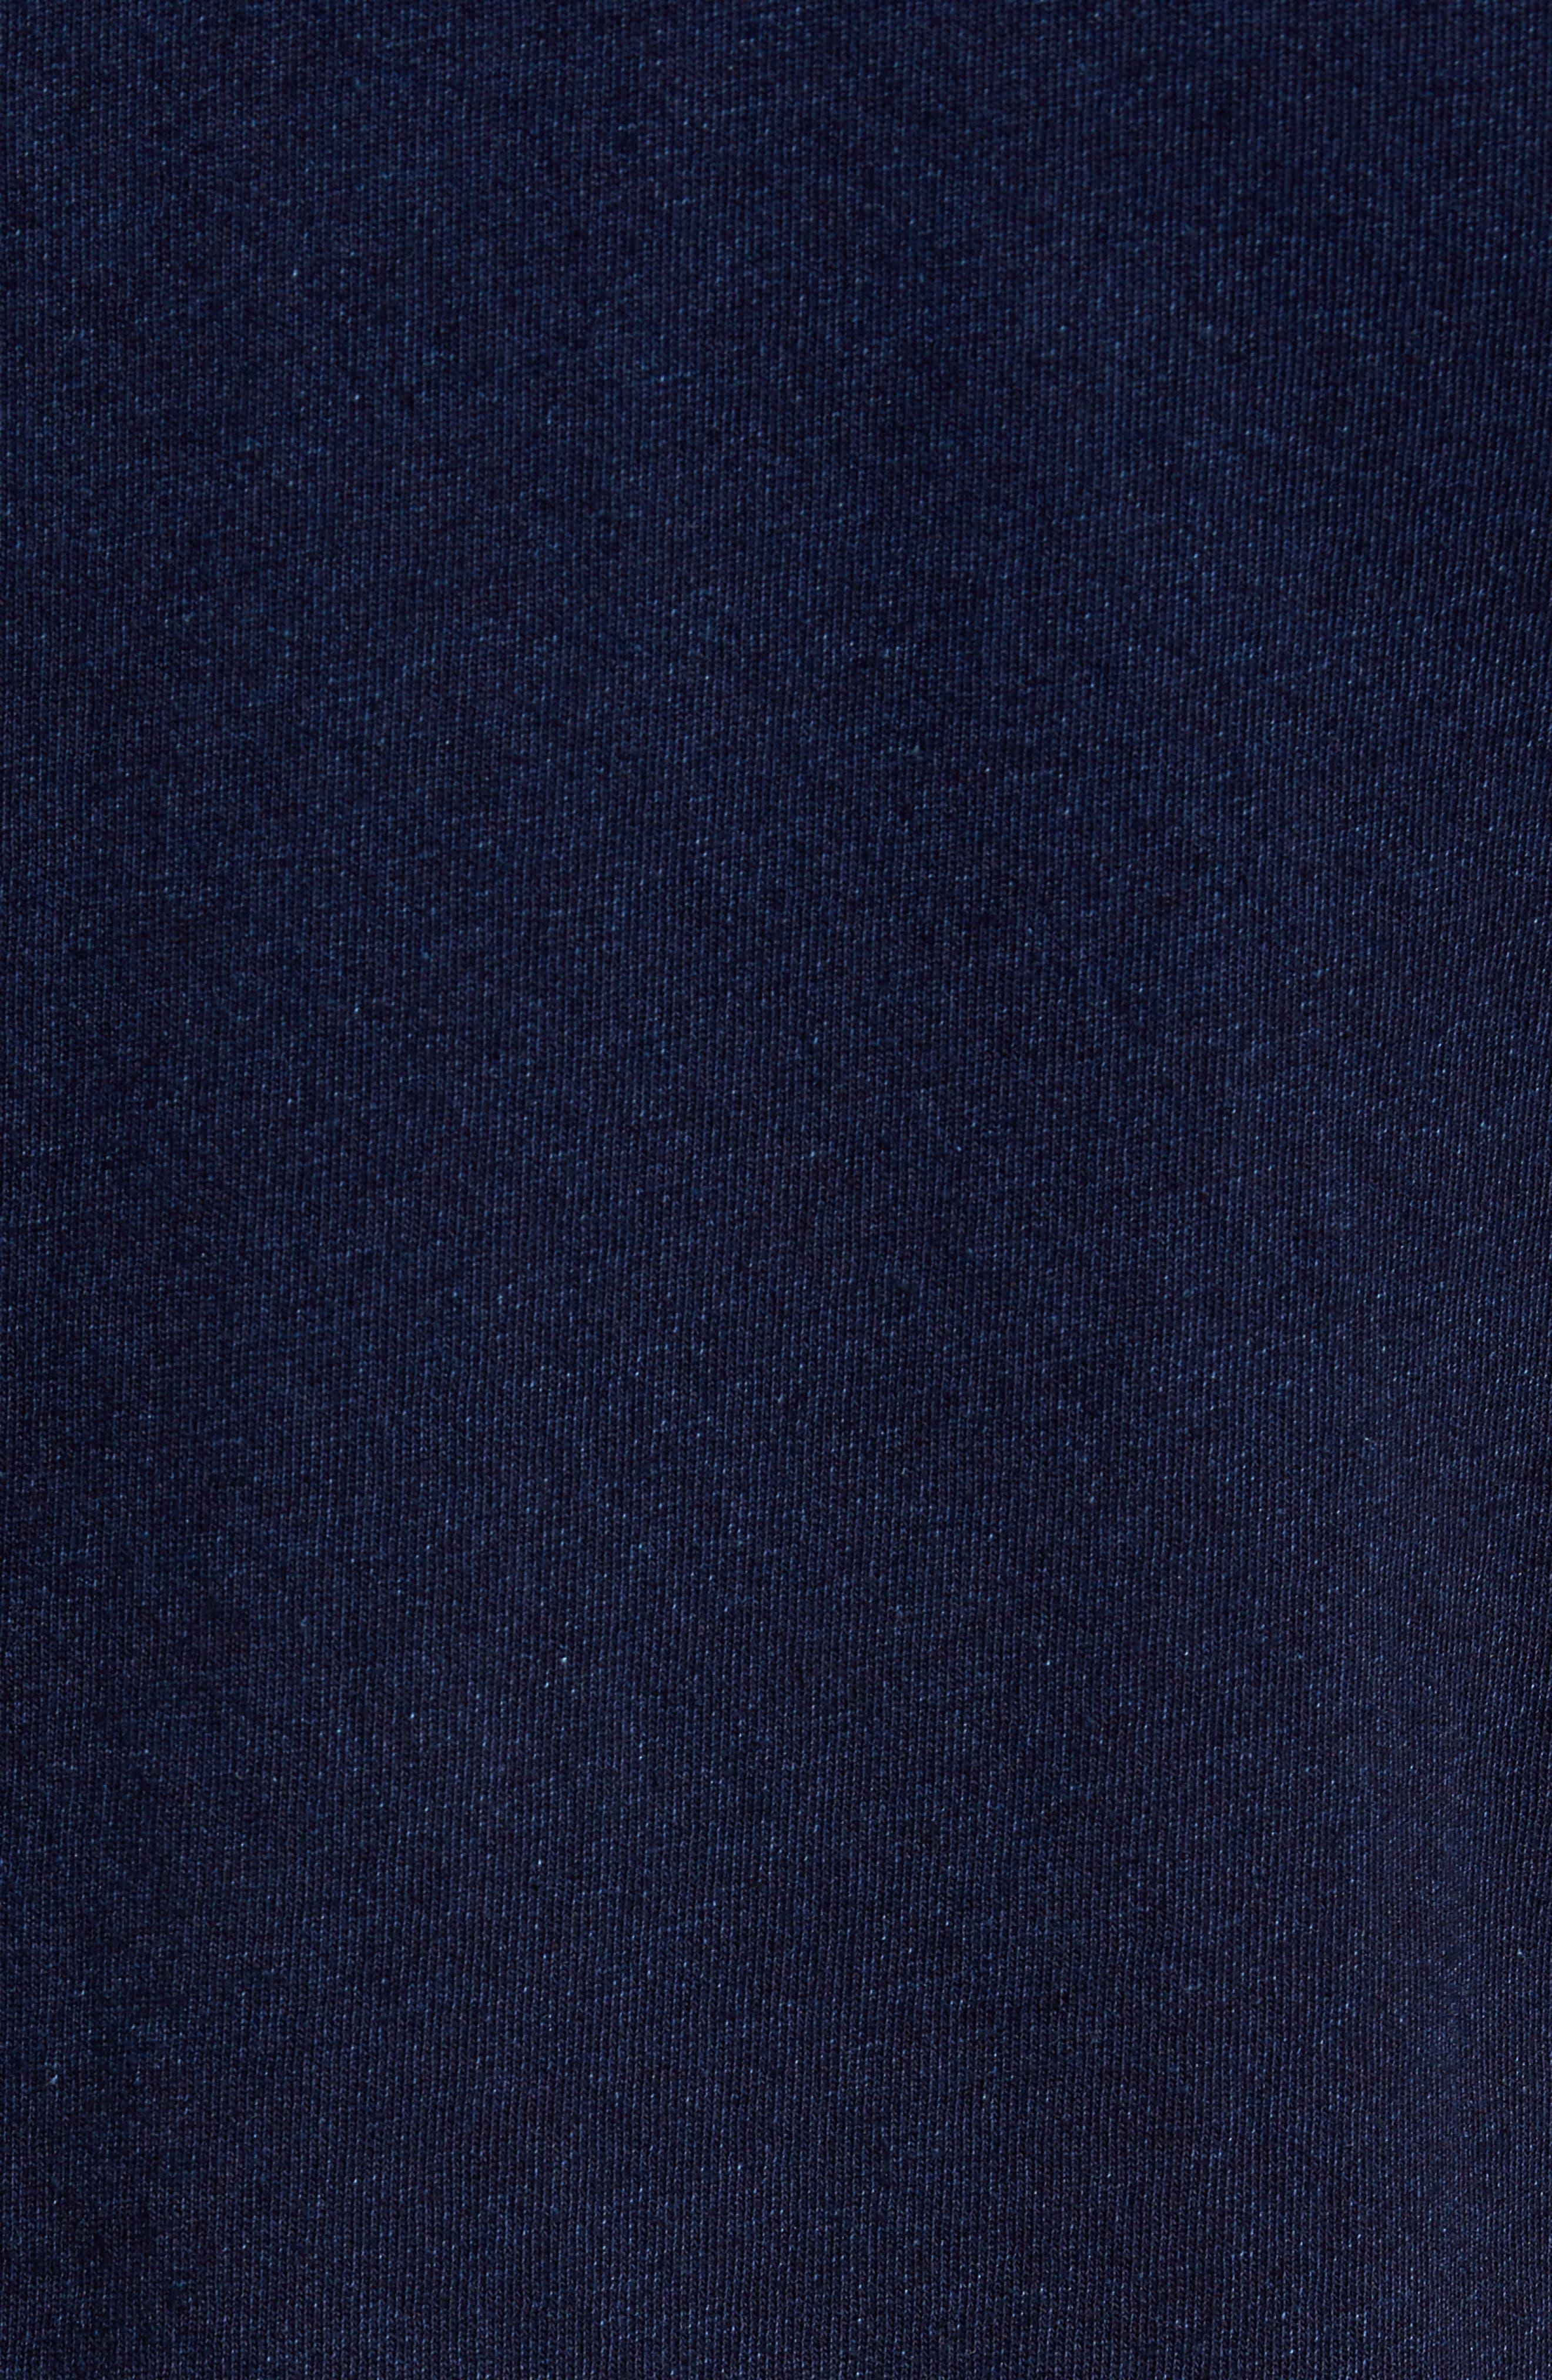 Denim Trim Jersey Polo,                             Alternate thumbnail 5, color,                             439